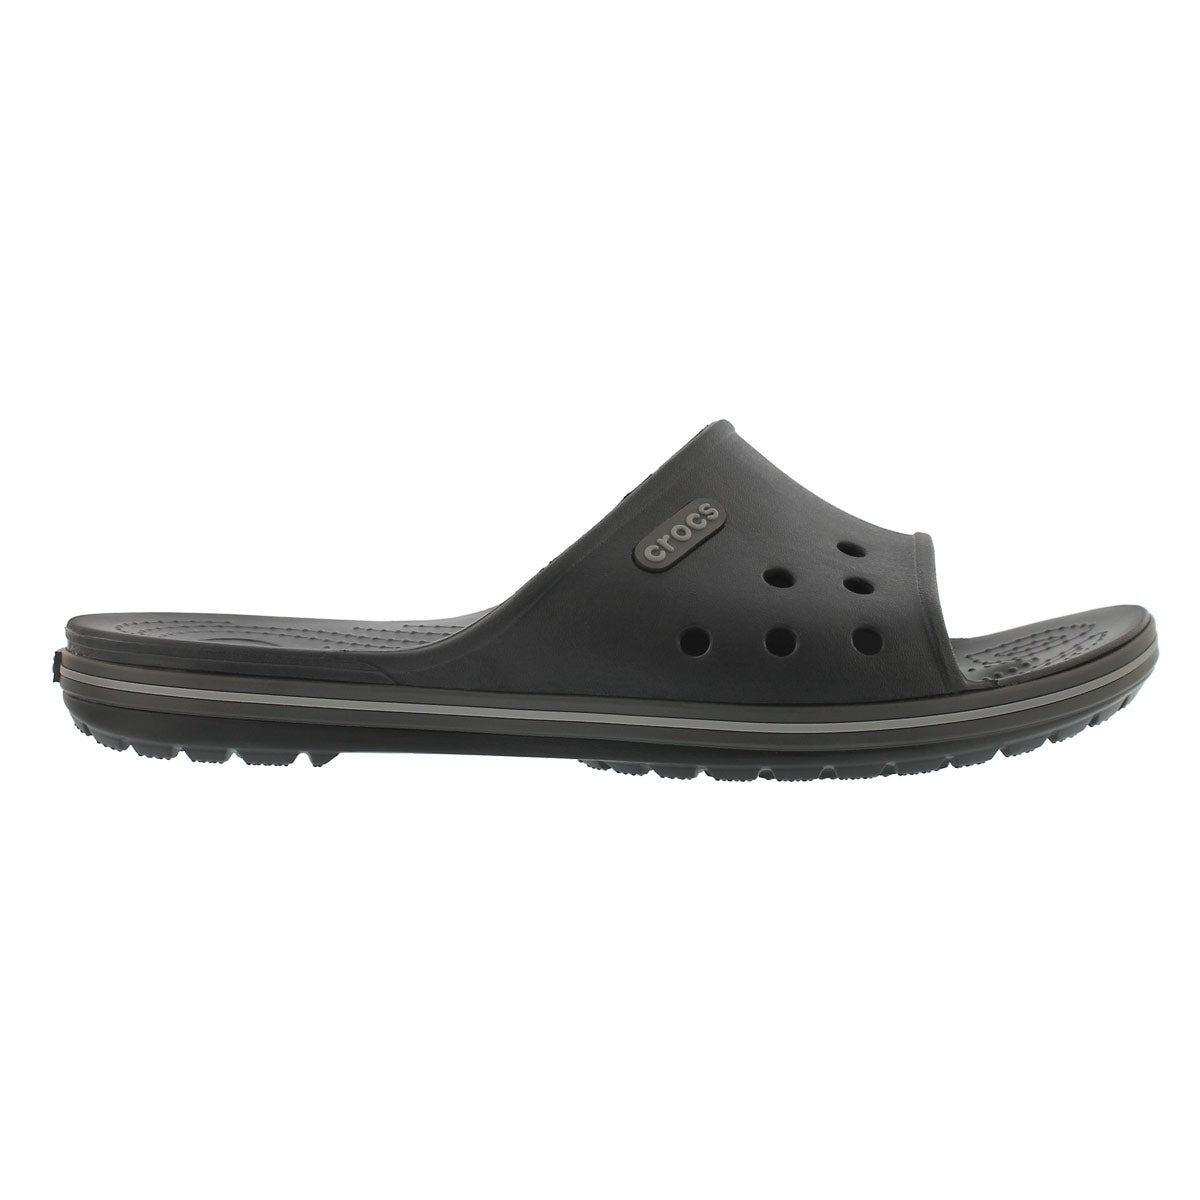 Mns Crocband II black/graphite sandal